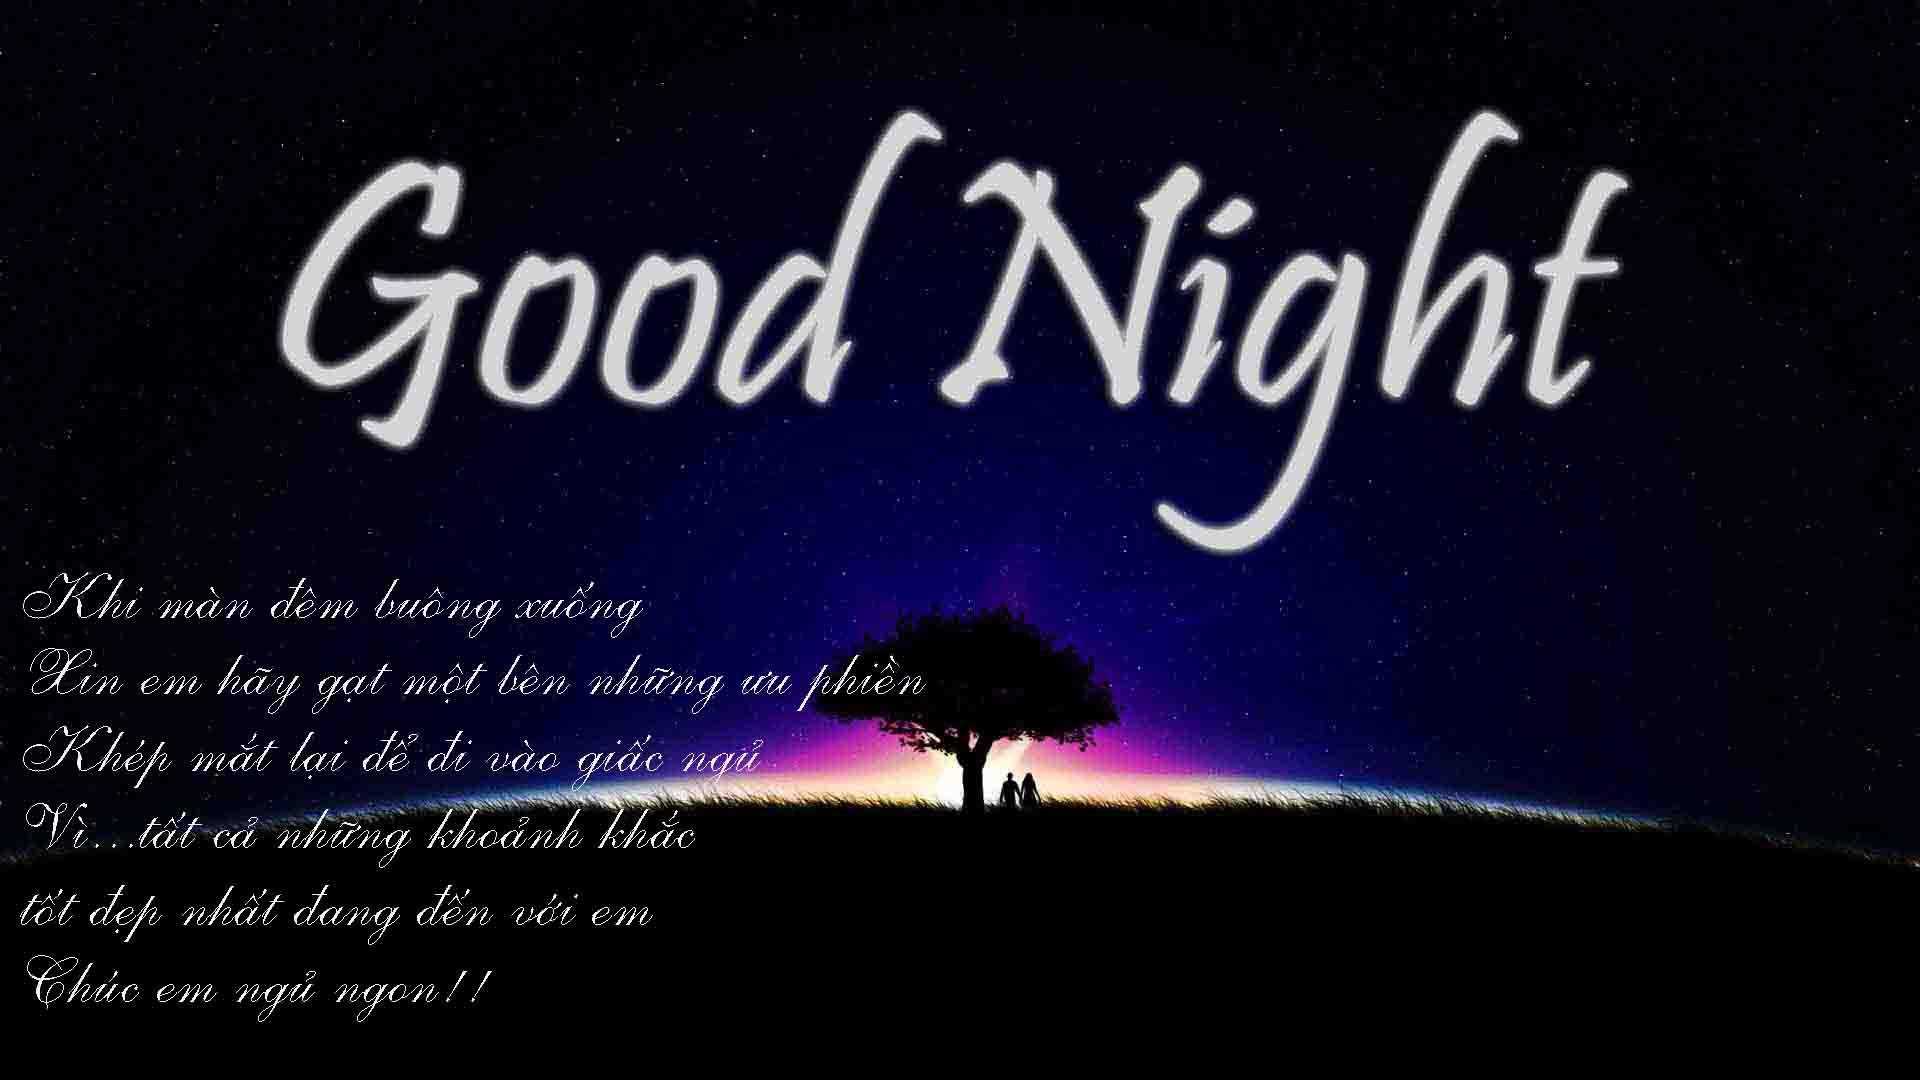 Ảnh good night hay